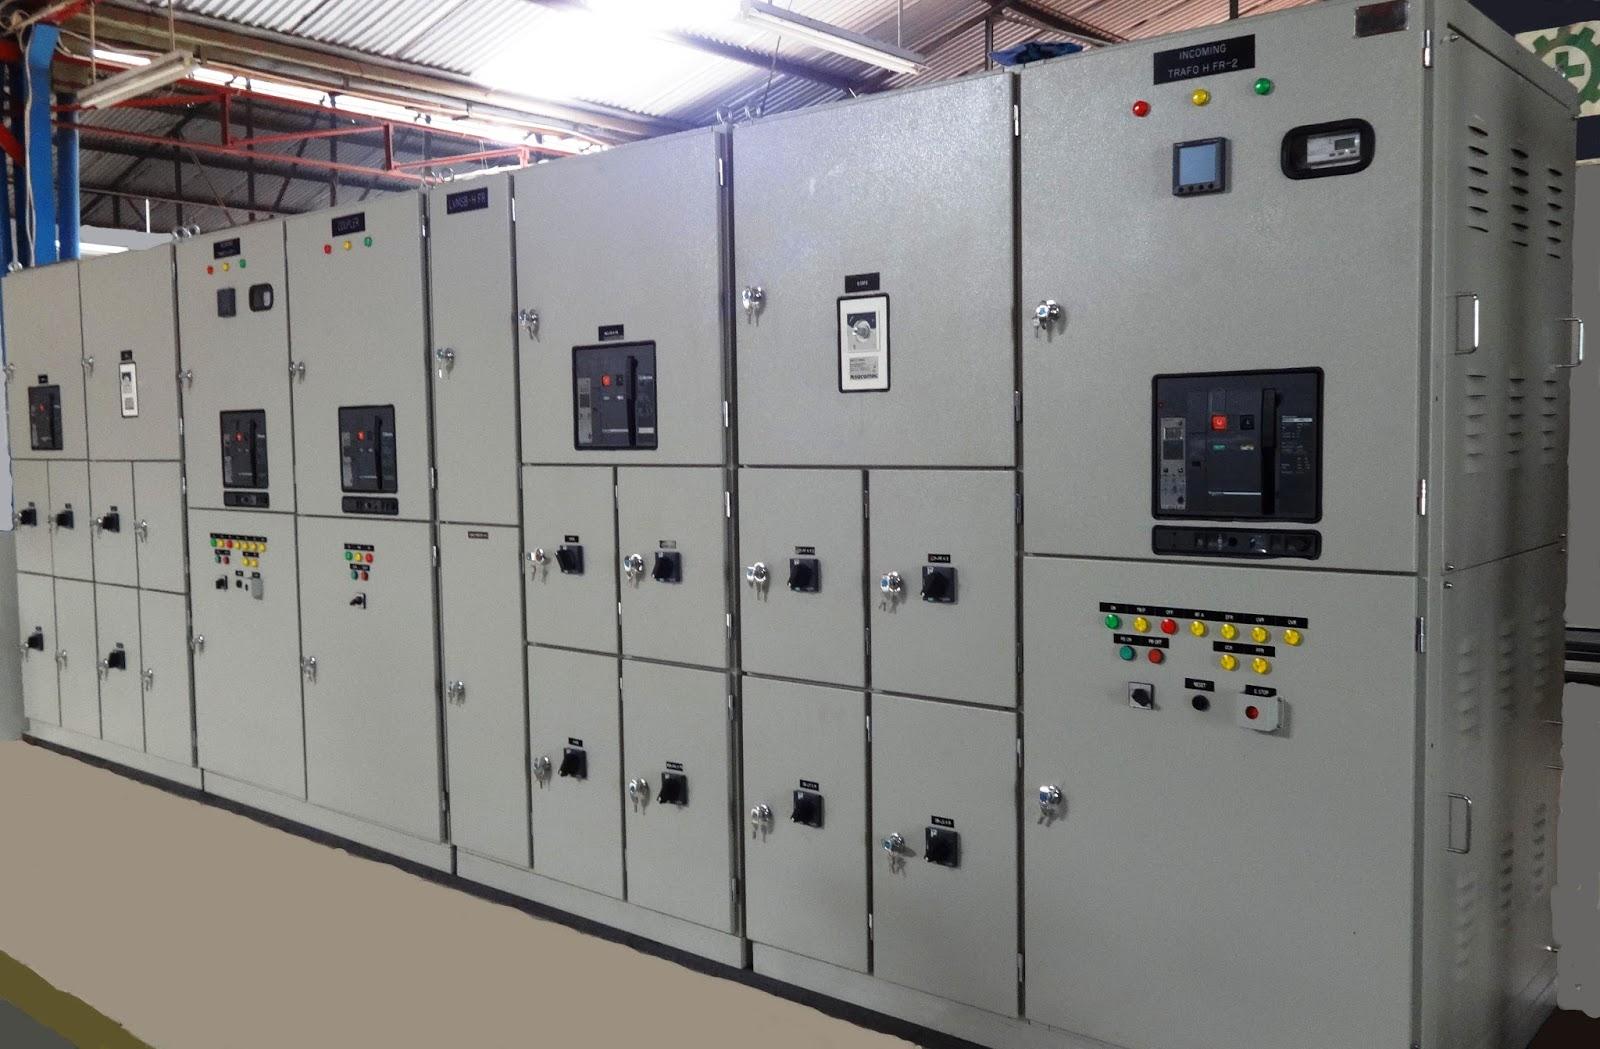 lowongan kerja teknisi instalasi listrik pt duta wijaya elektrindo rh info kabupaten bekasi blogspot com